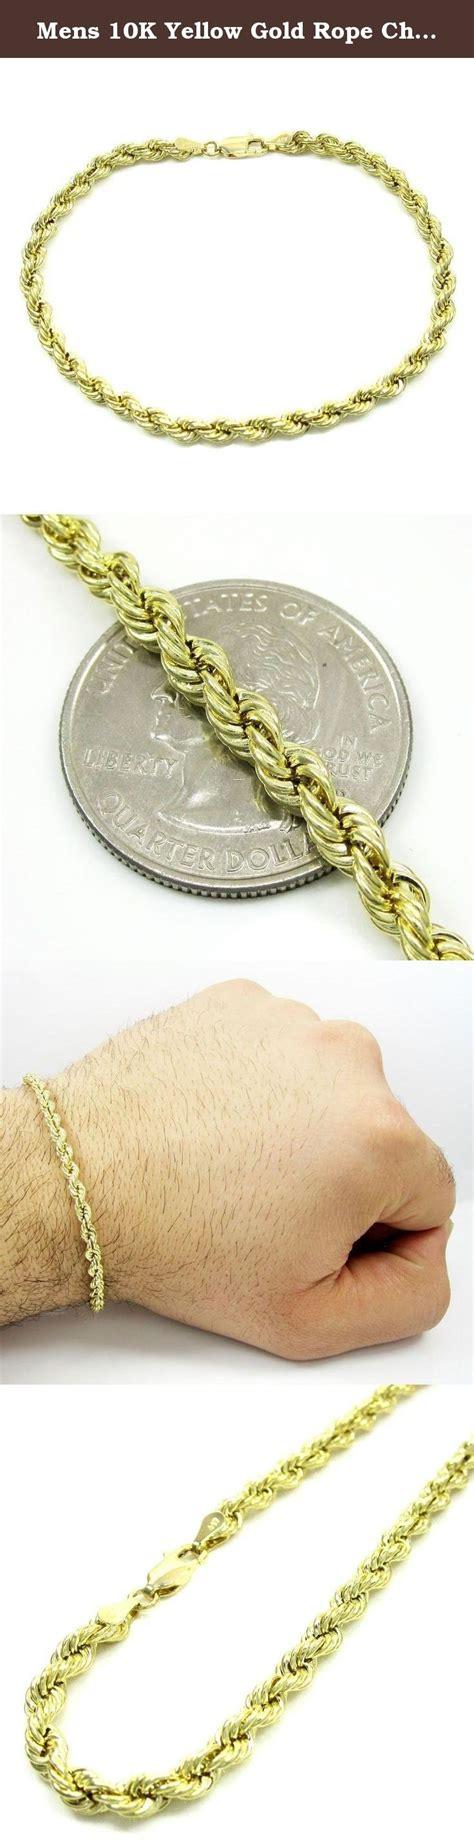 mens 10k yellow gold rope chain wrist bracelet size 7 quot 9